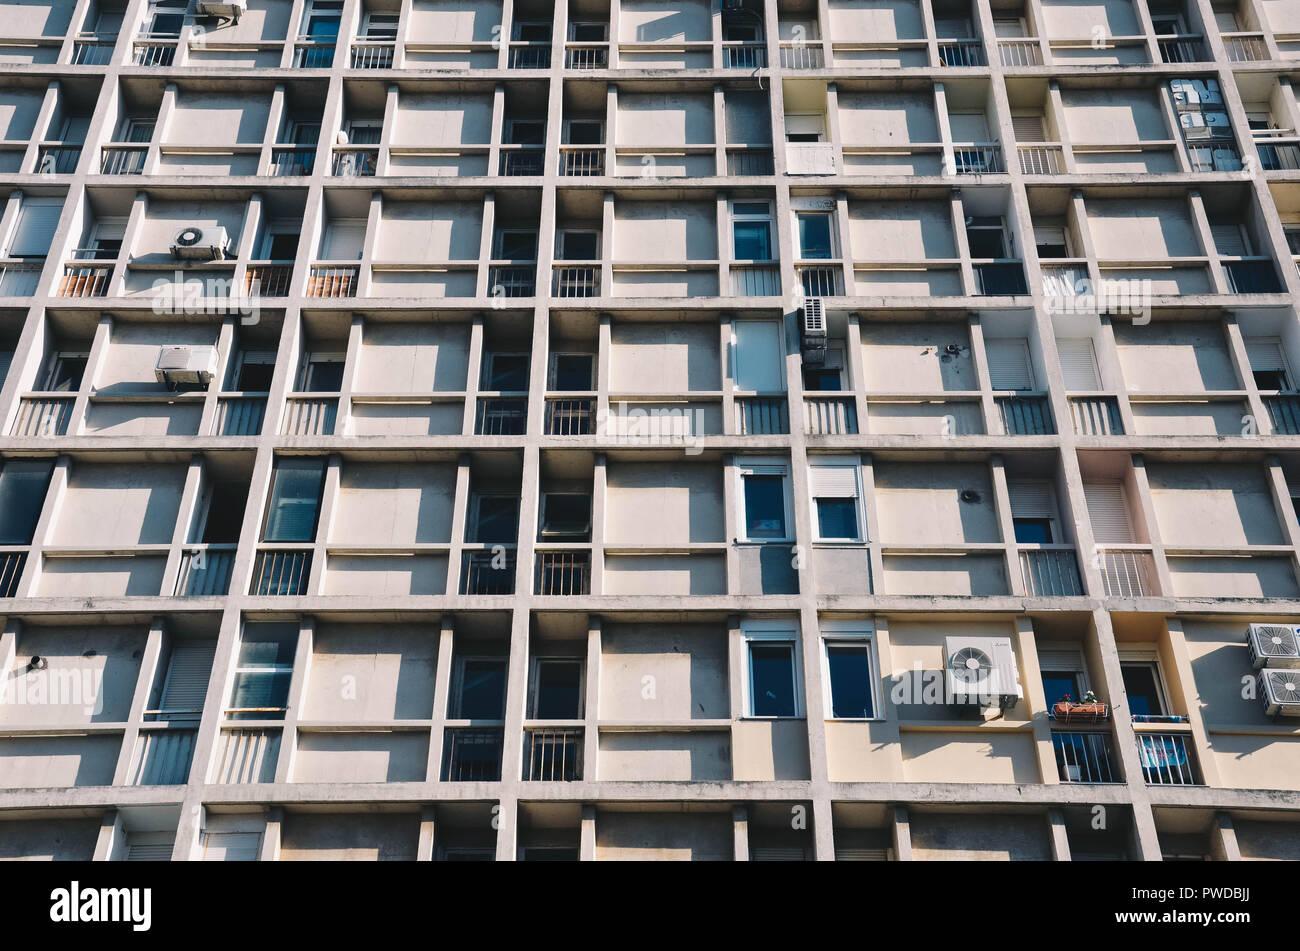 A residential housing block in Poljud, Split, Croatia, September 2018 Stock Photo